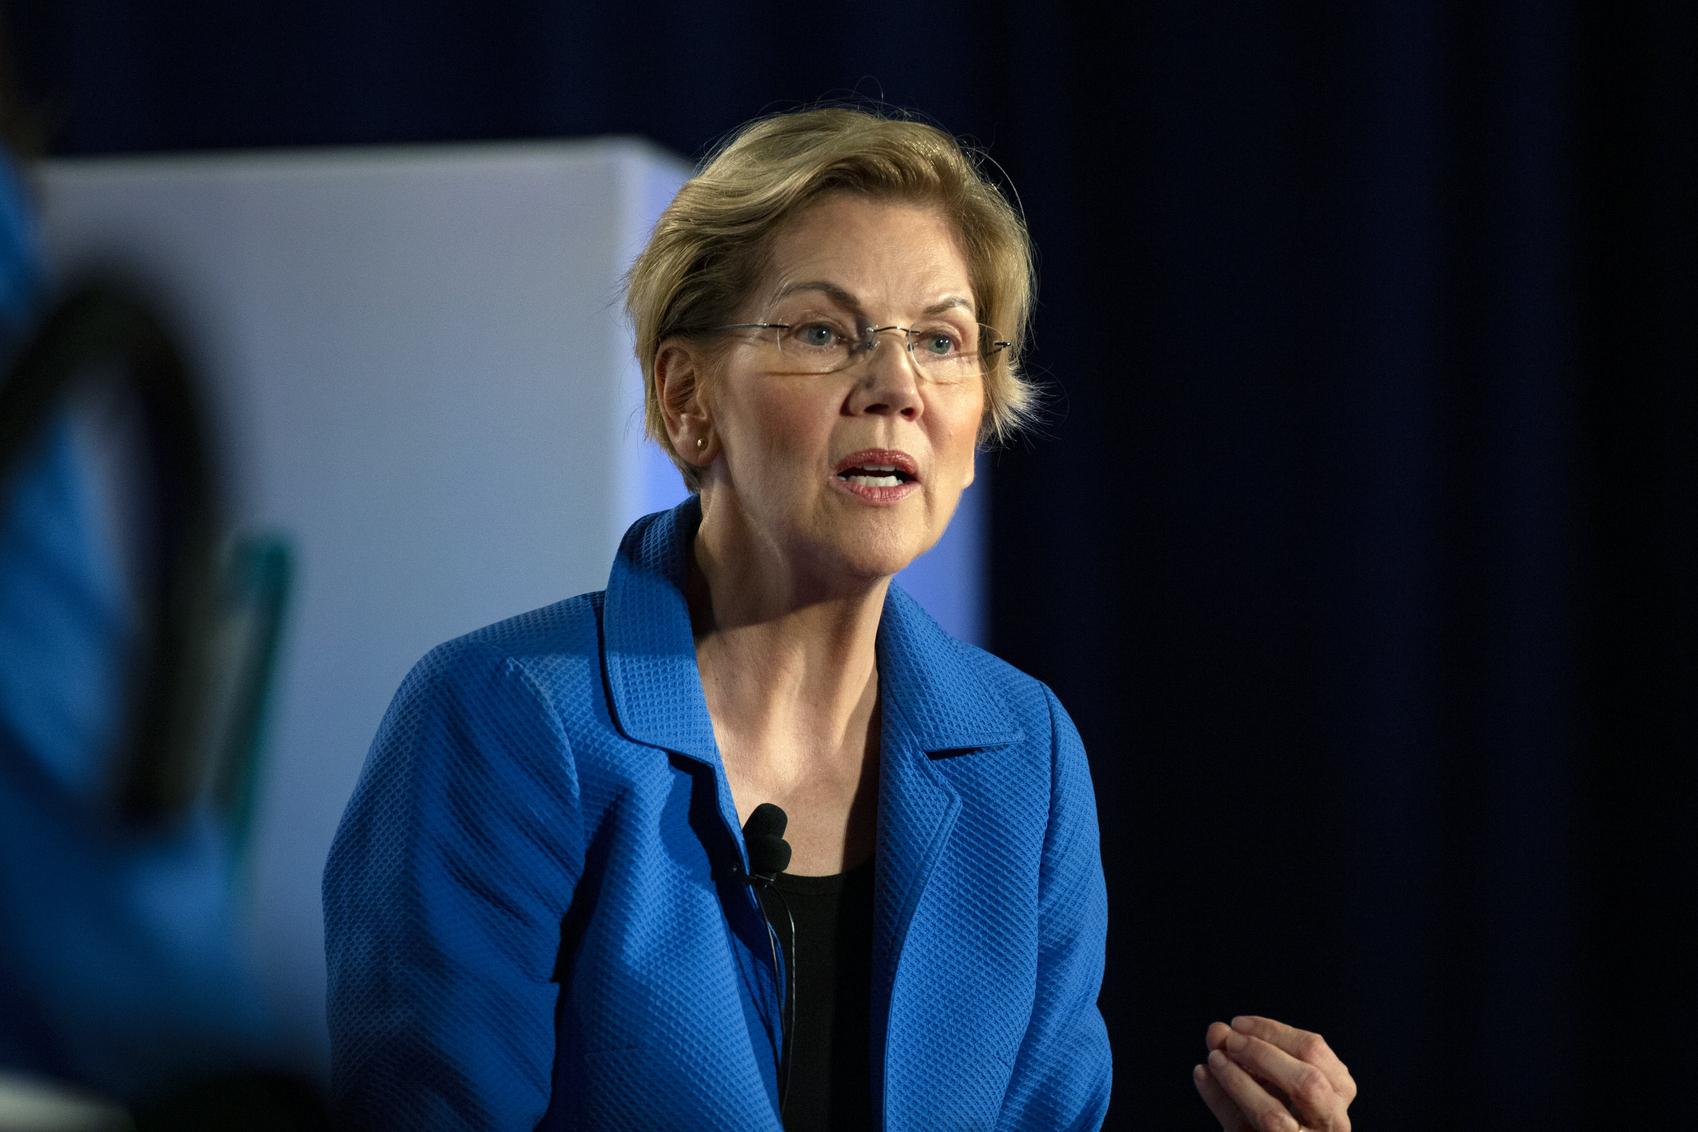 Elizabeth Warren warns Trump economy headed for a crash